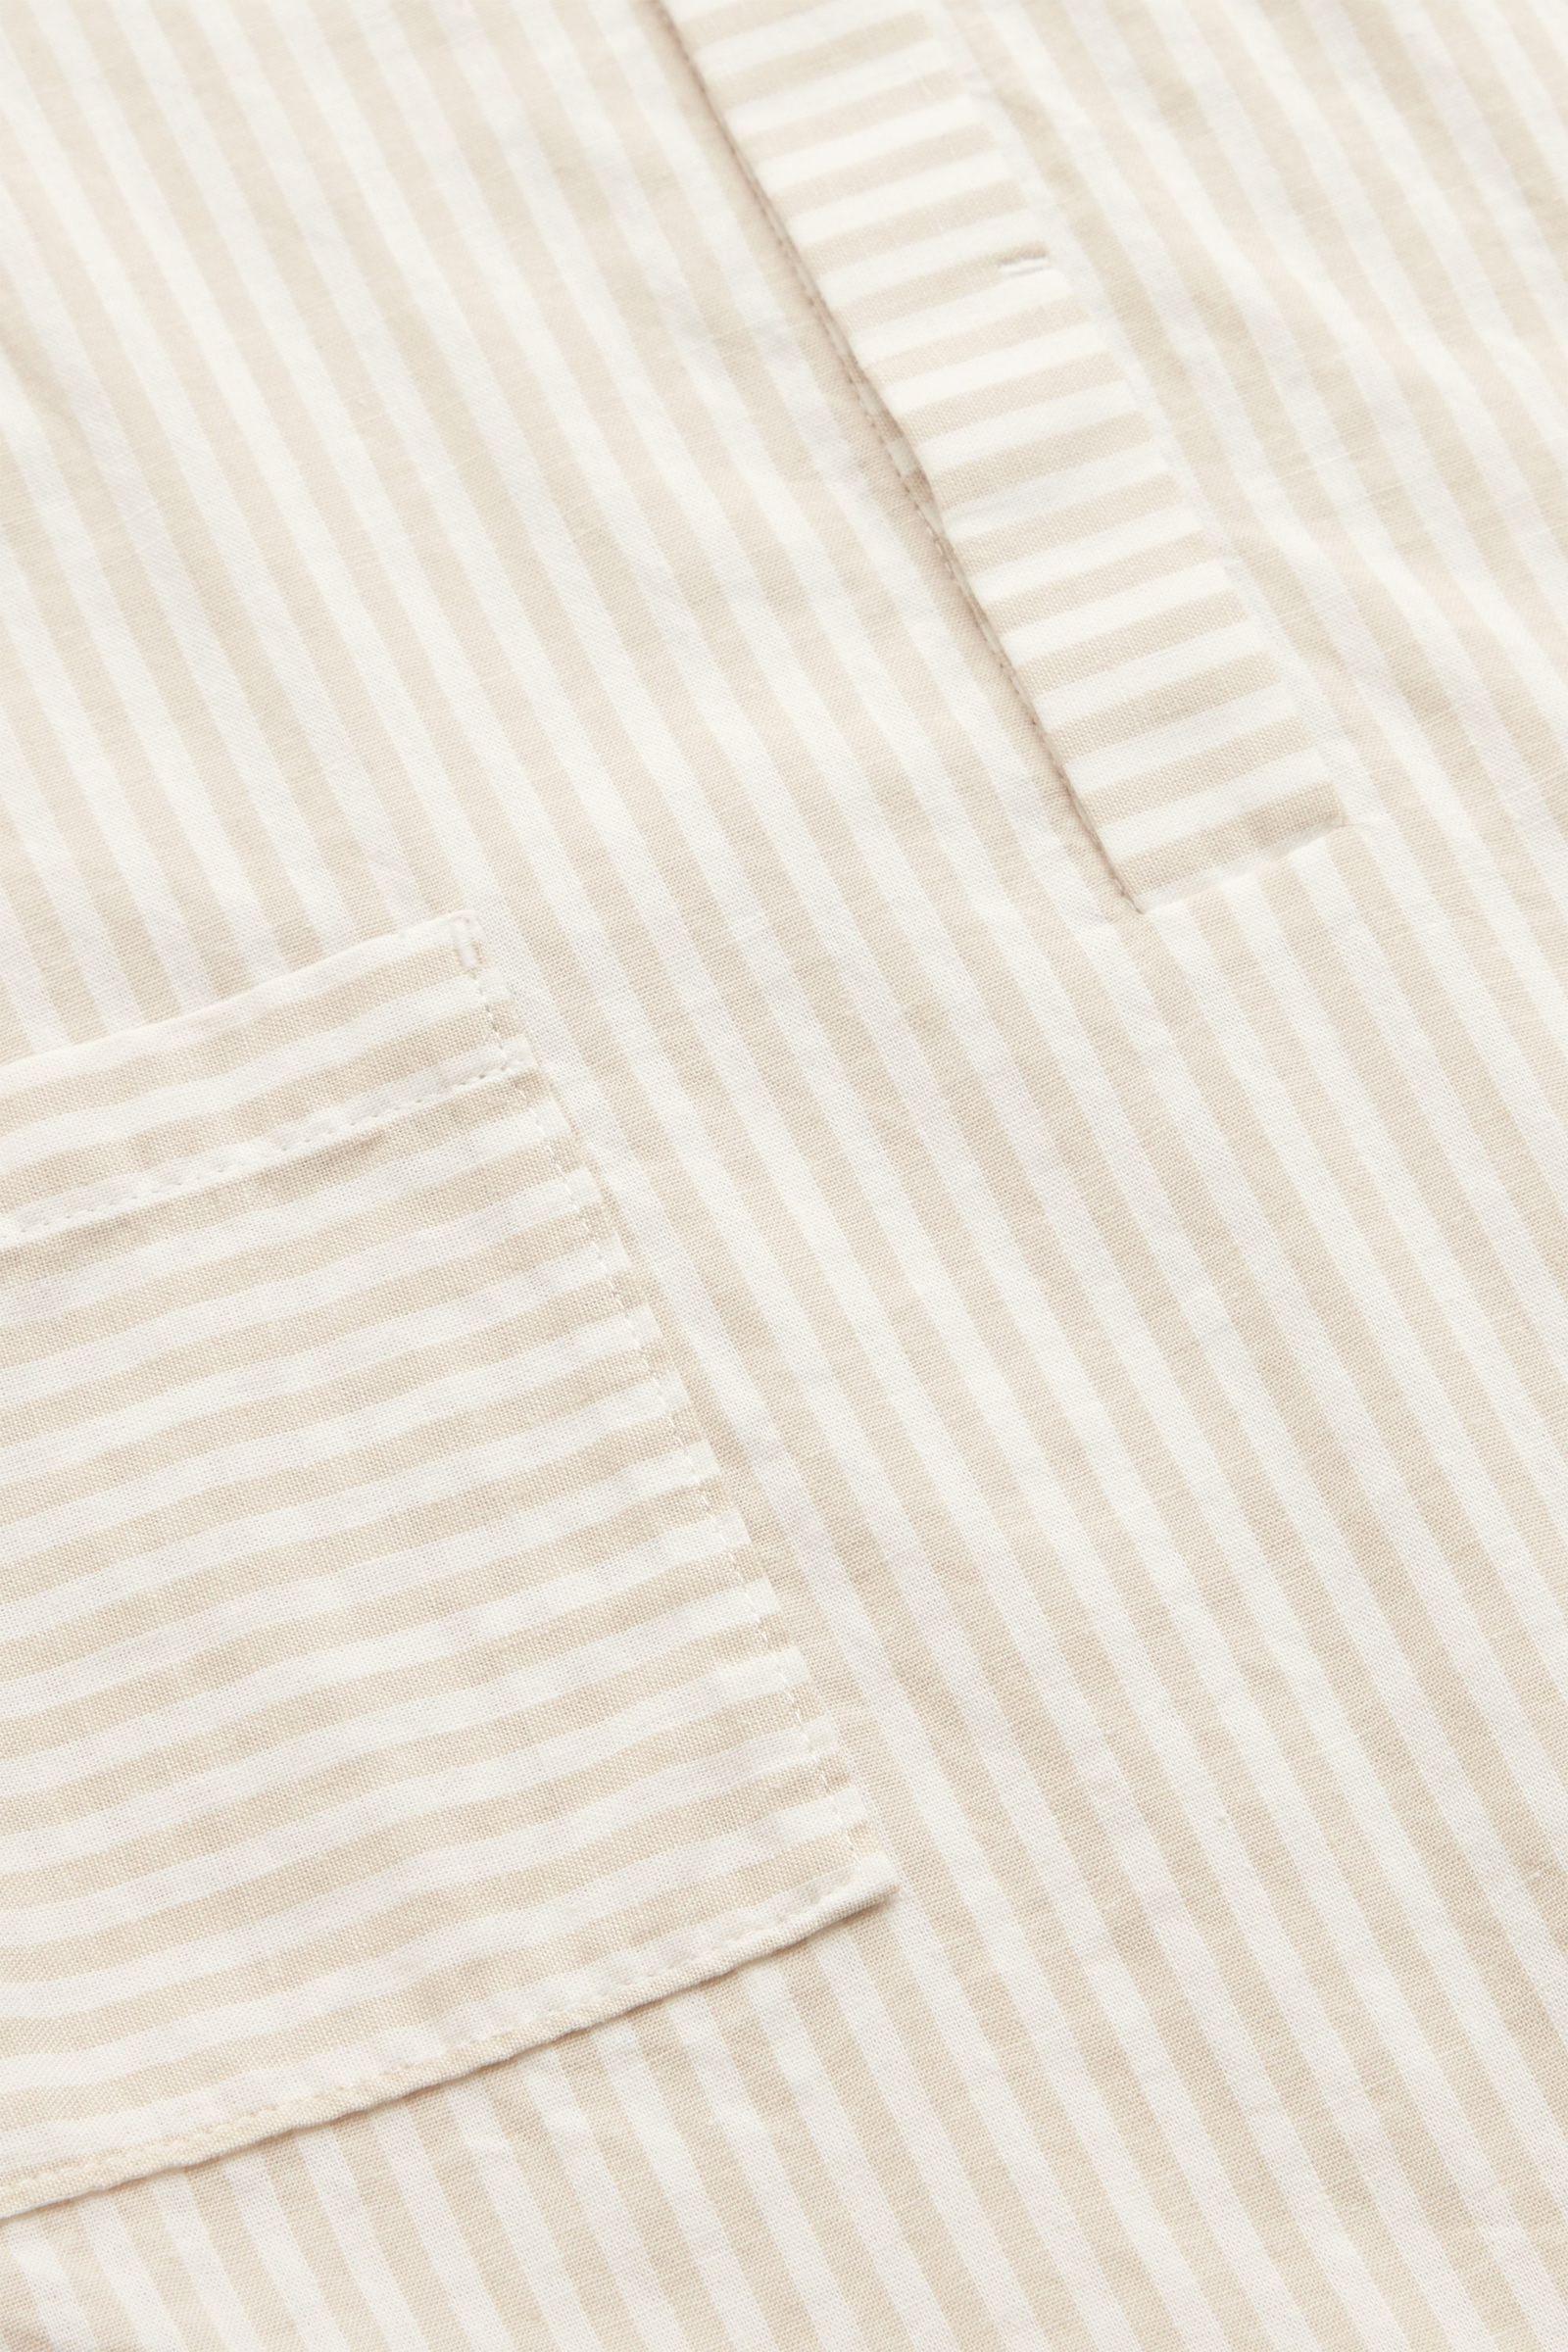 COS 코튼 리넨 포켓 롬퍼의 화이트 / 베이지컬러 Detail입니다.